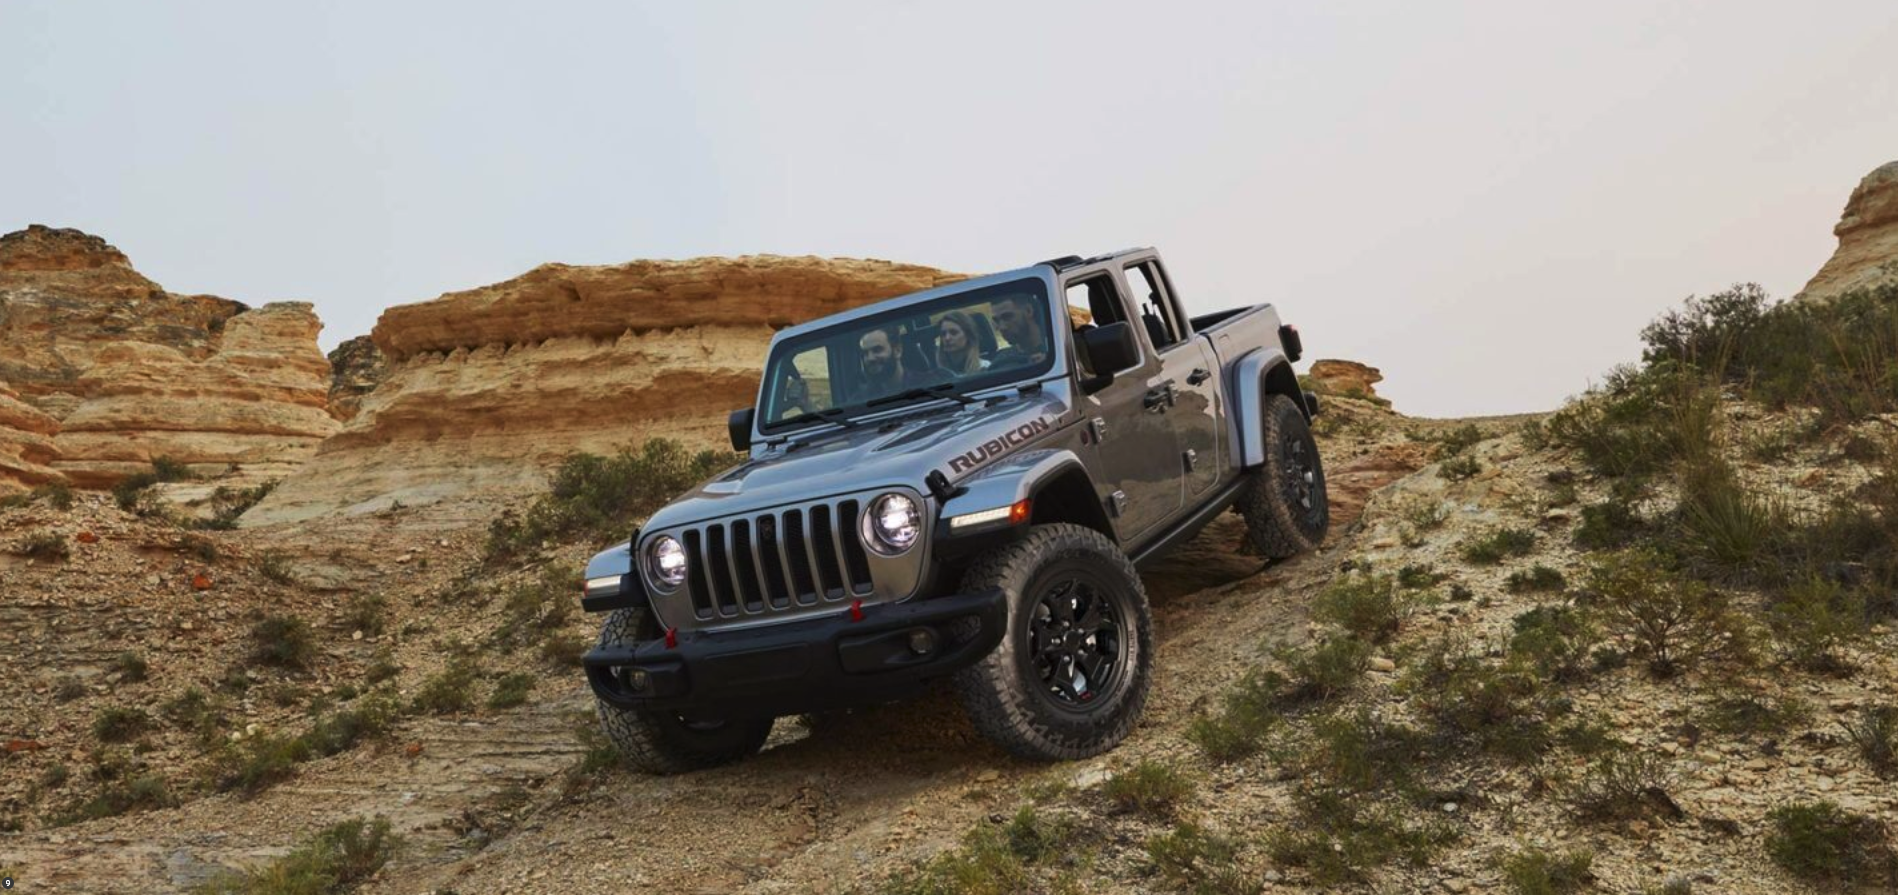 Jeep U S Military Car Buying Program Military Autosource Mas